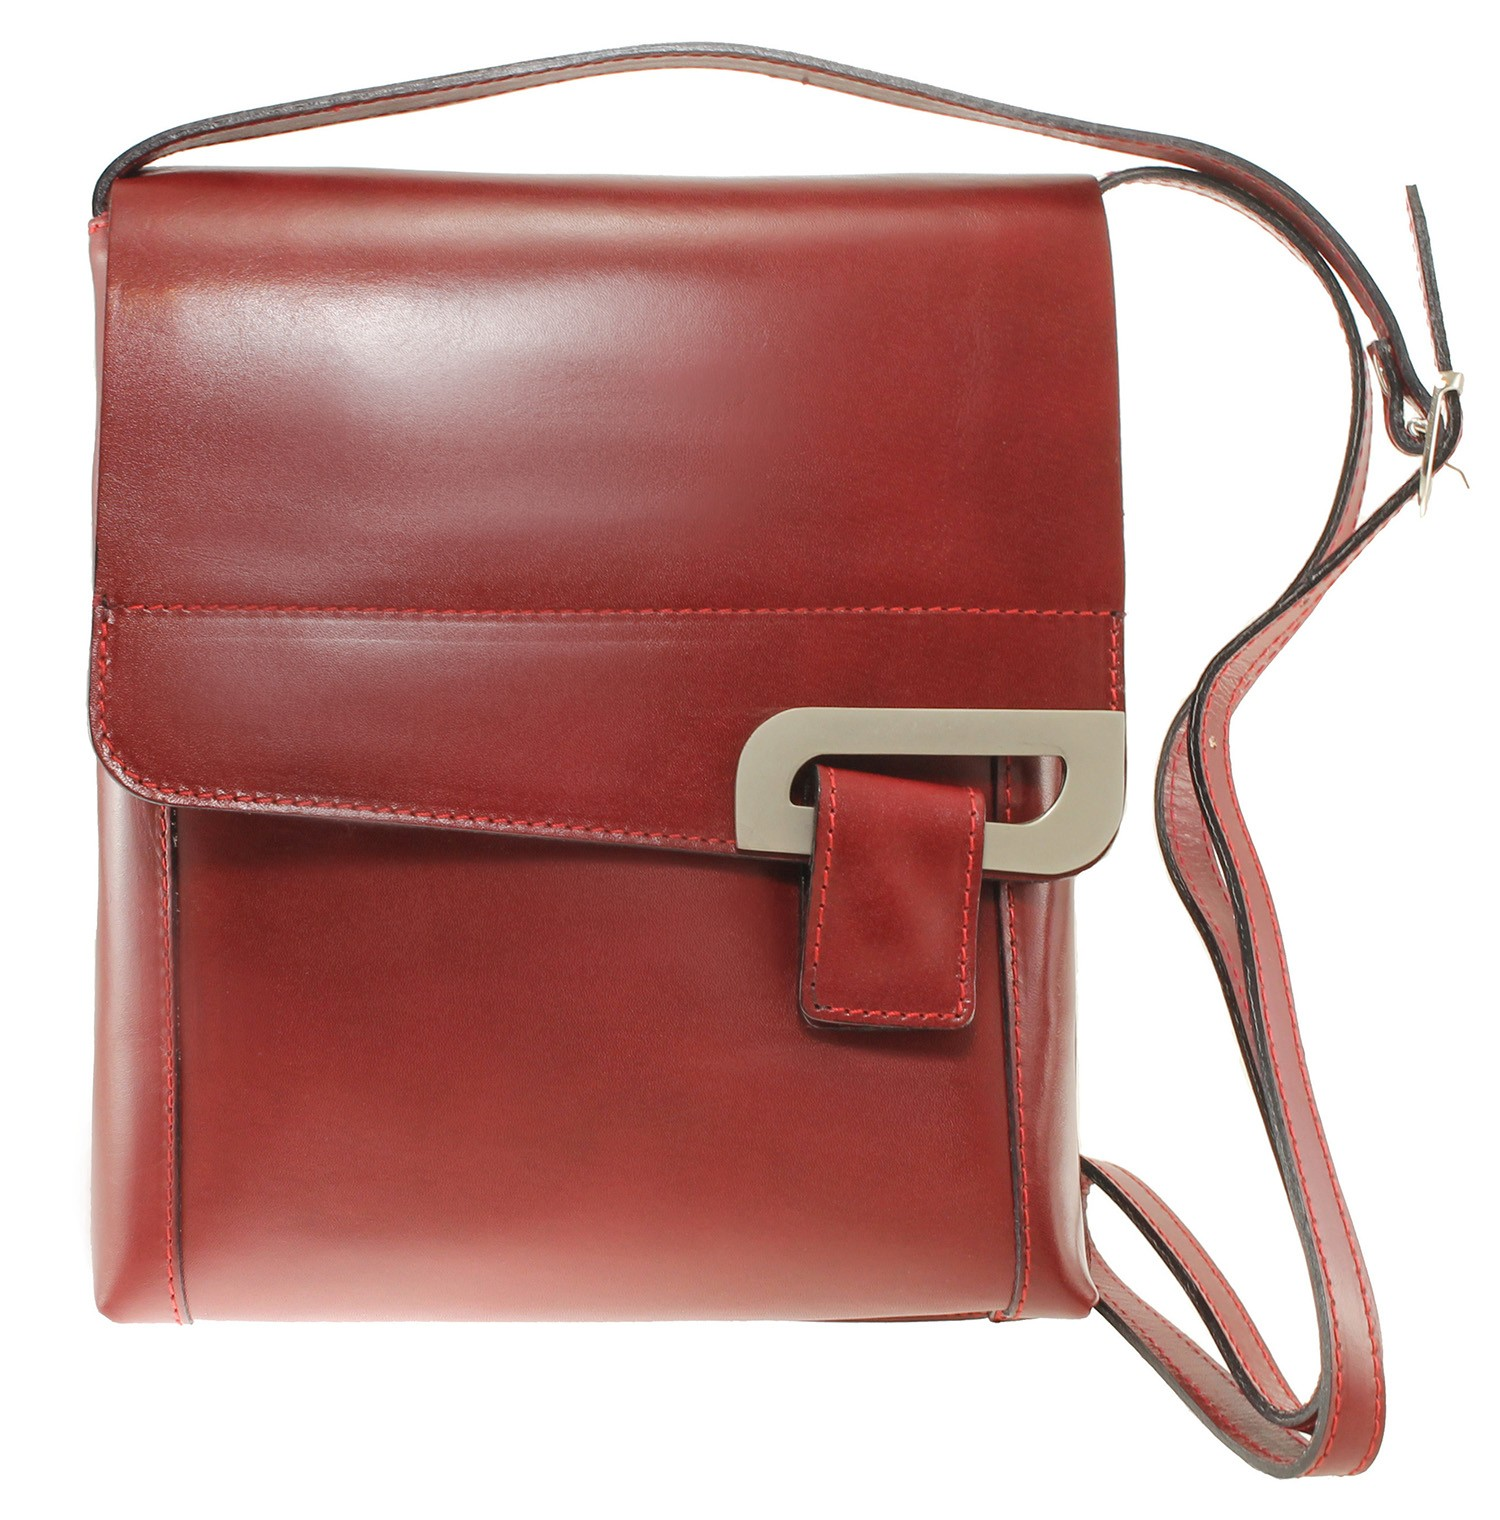 kožená menší unisex červená bordó crossbody kabelka na rameno Jorge